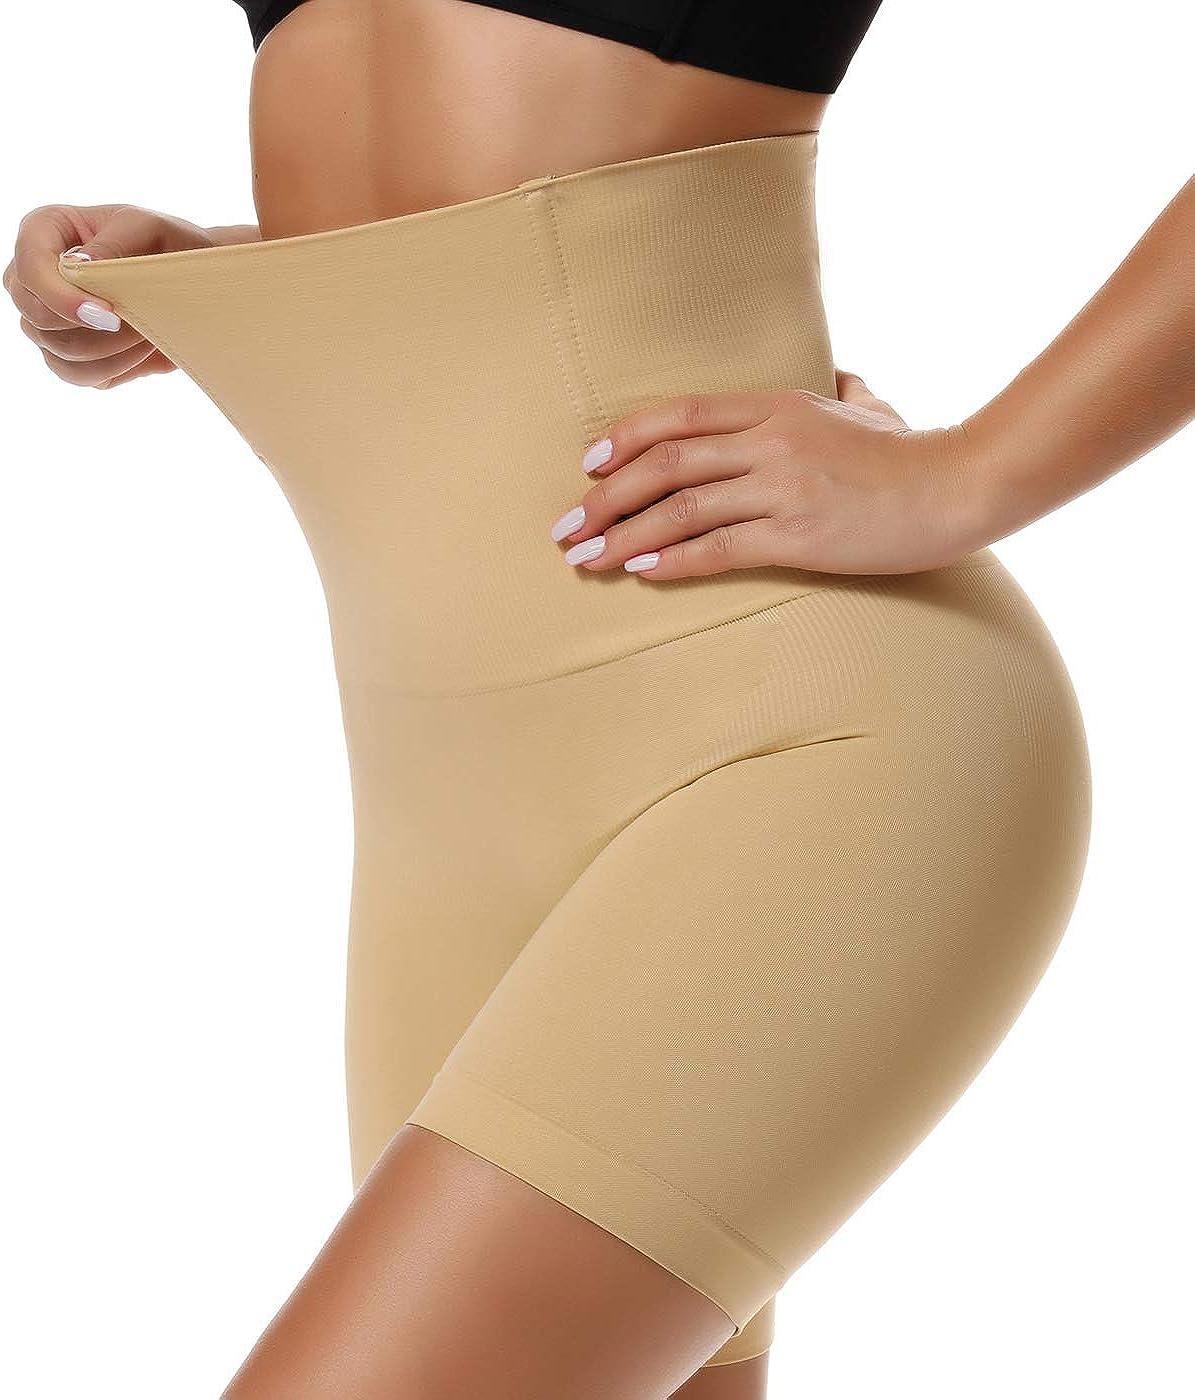 SLIMBELLE Pantalones Moldeadores para Mujer Braguita Moldeadora Cintura Alta Braga Faja Reductora Postparto Abdomen Adelgazante Shapewear Lenceria